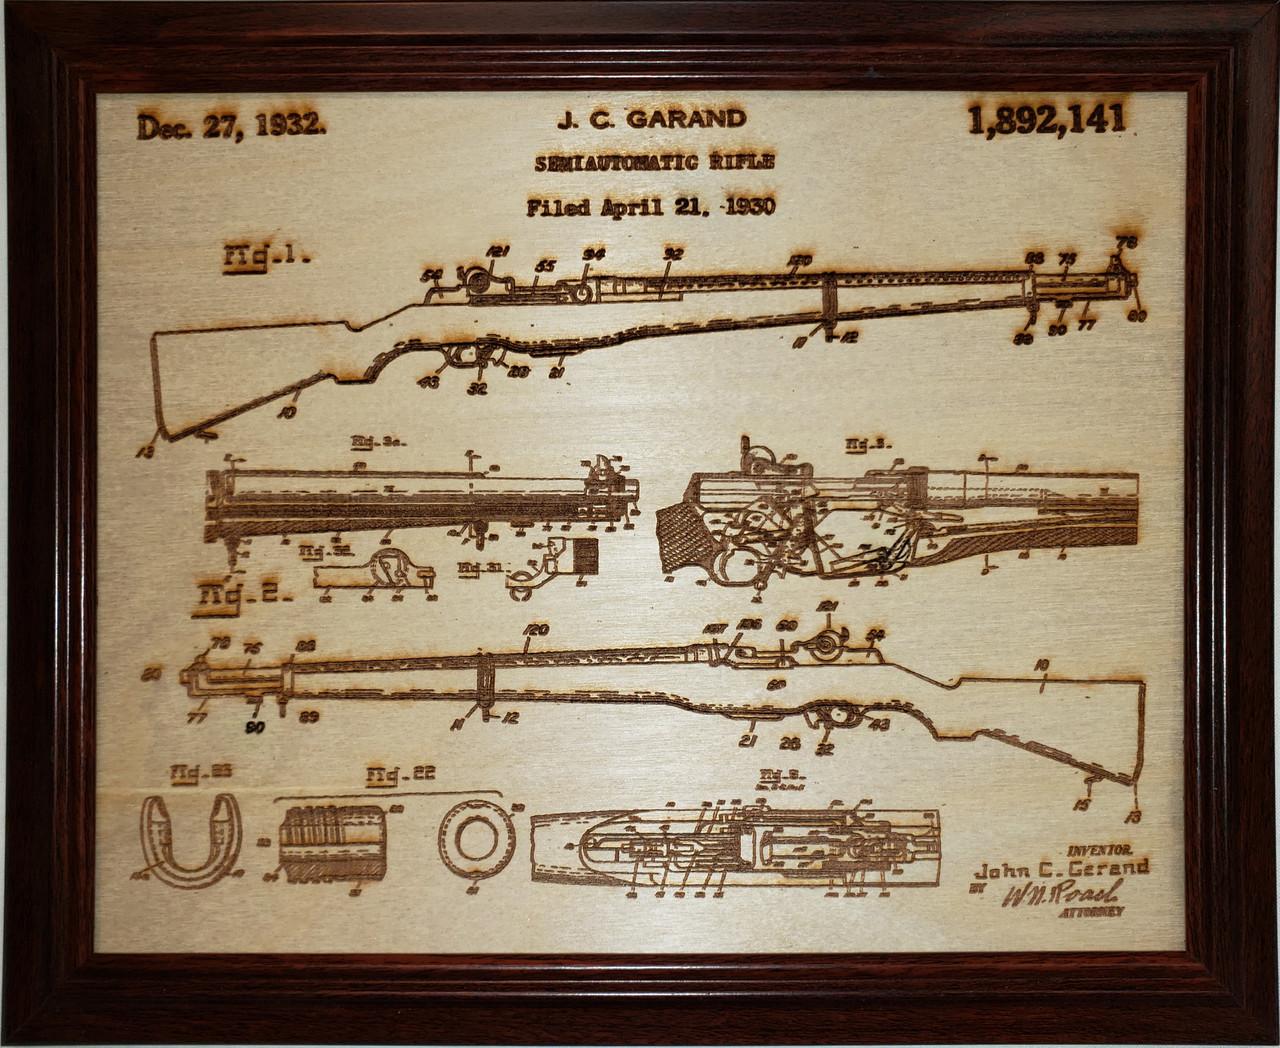 Framed laser art details of the M-1 Garand patent #1,892,141